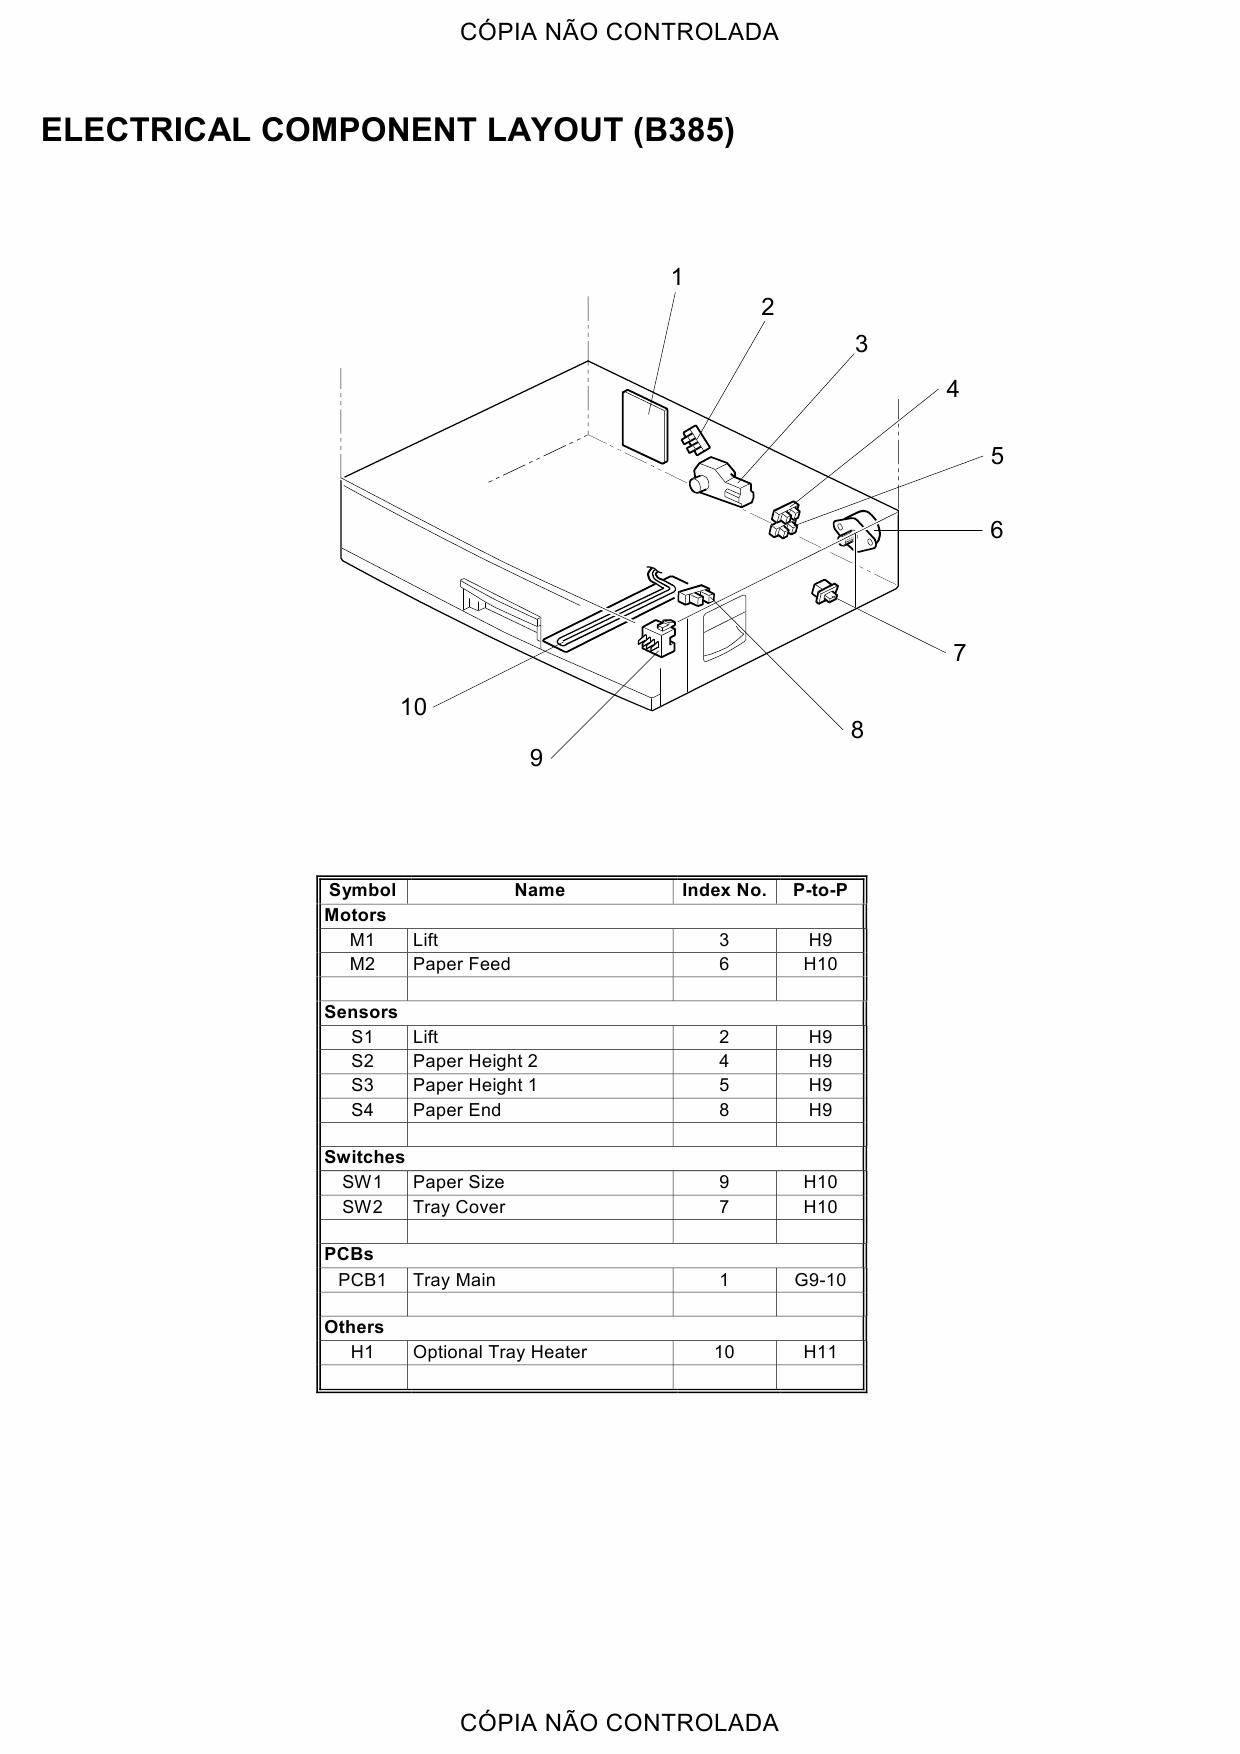 RICOH Aficio 1015 1018 1018D 1113 B039 B040 B043 B120 Circuit Diagram-4